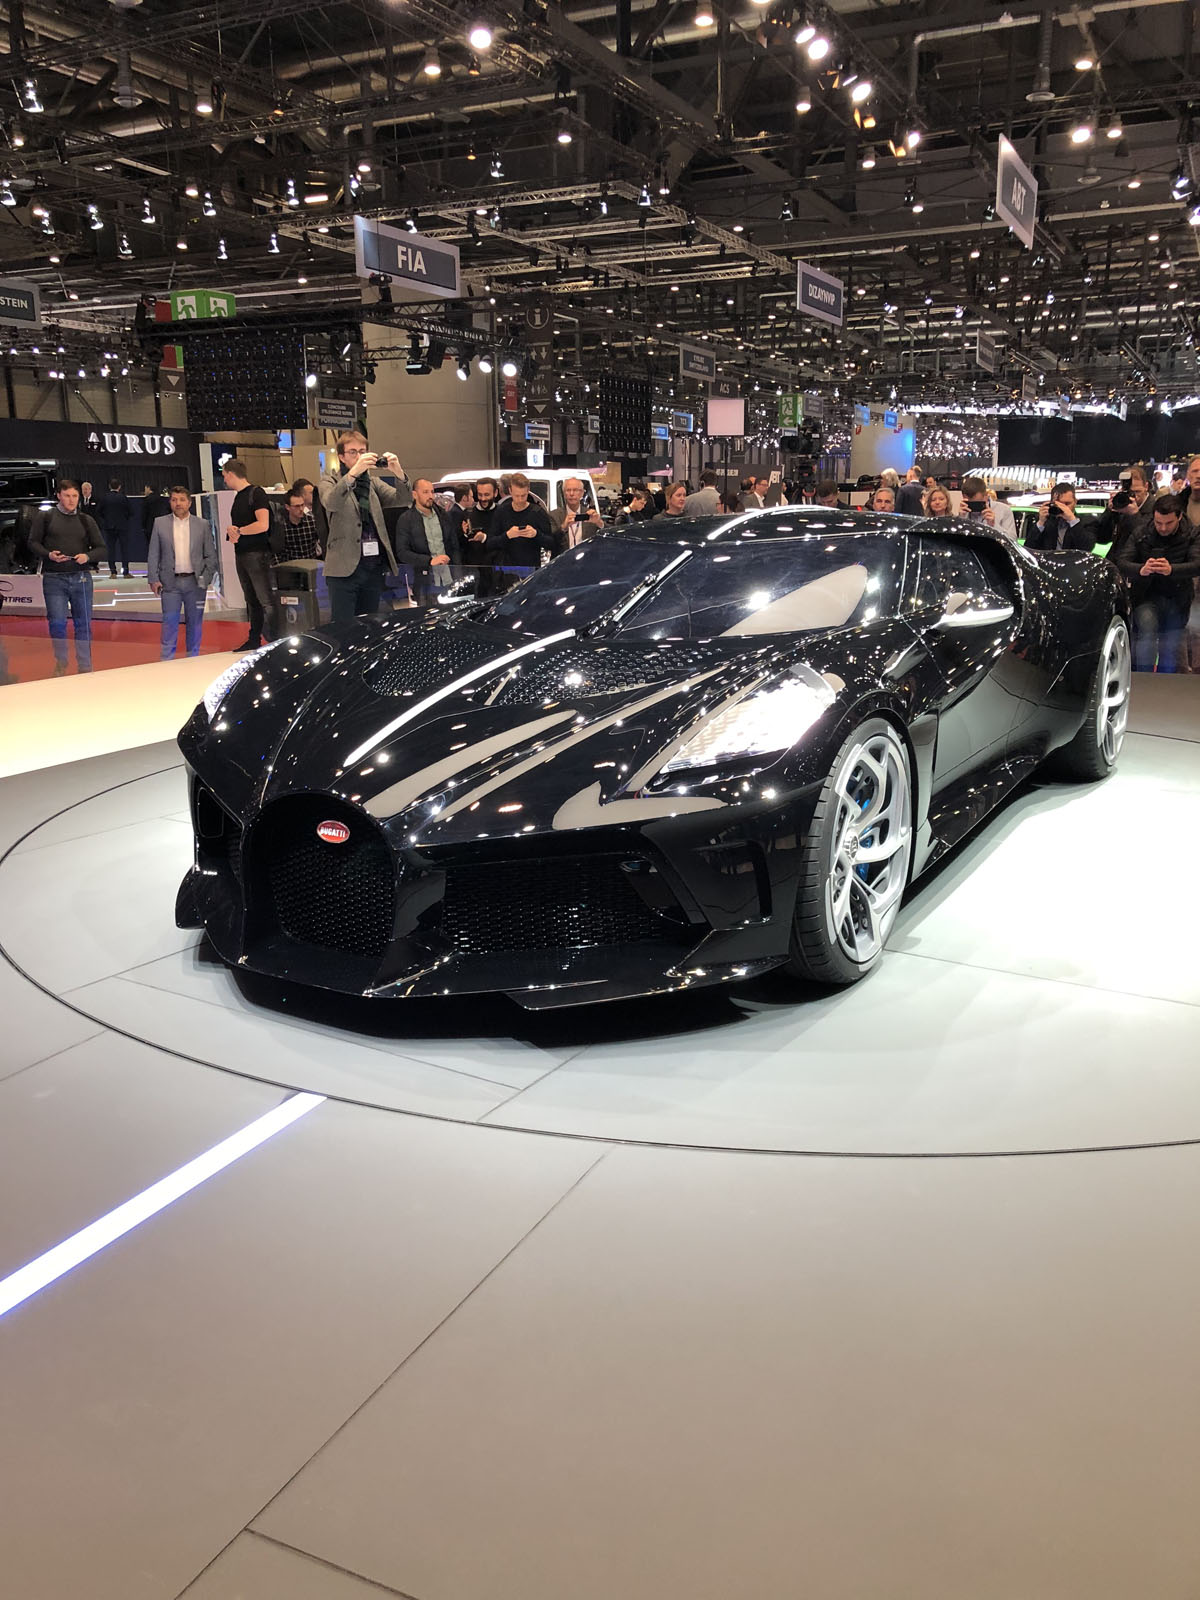 bugatti la voiture noire geneva pictures gallery  quick info motor illustrated